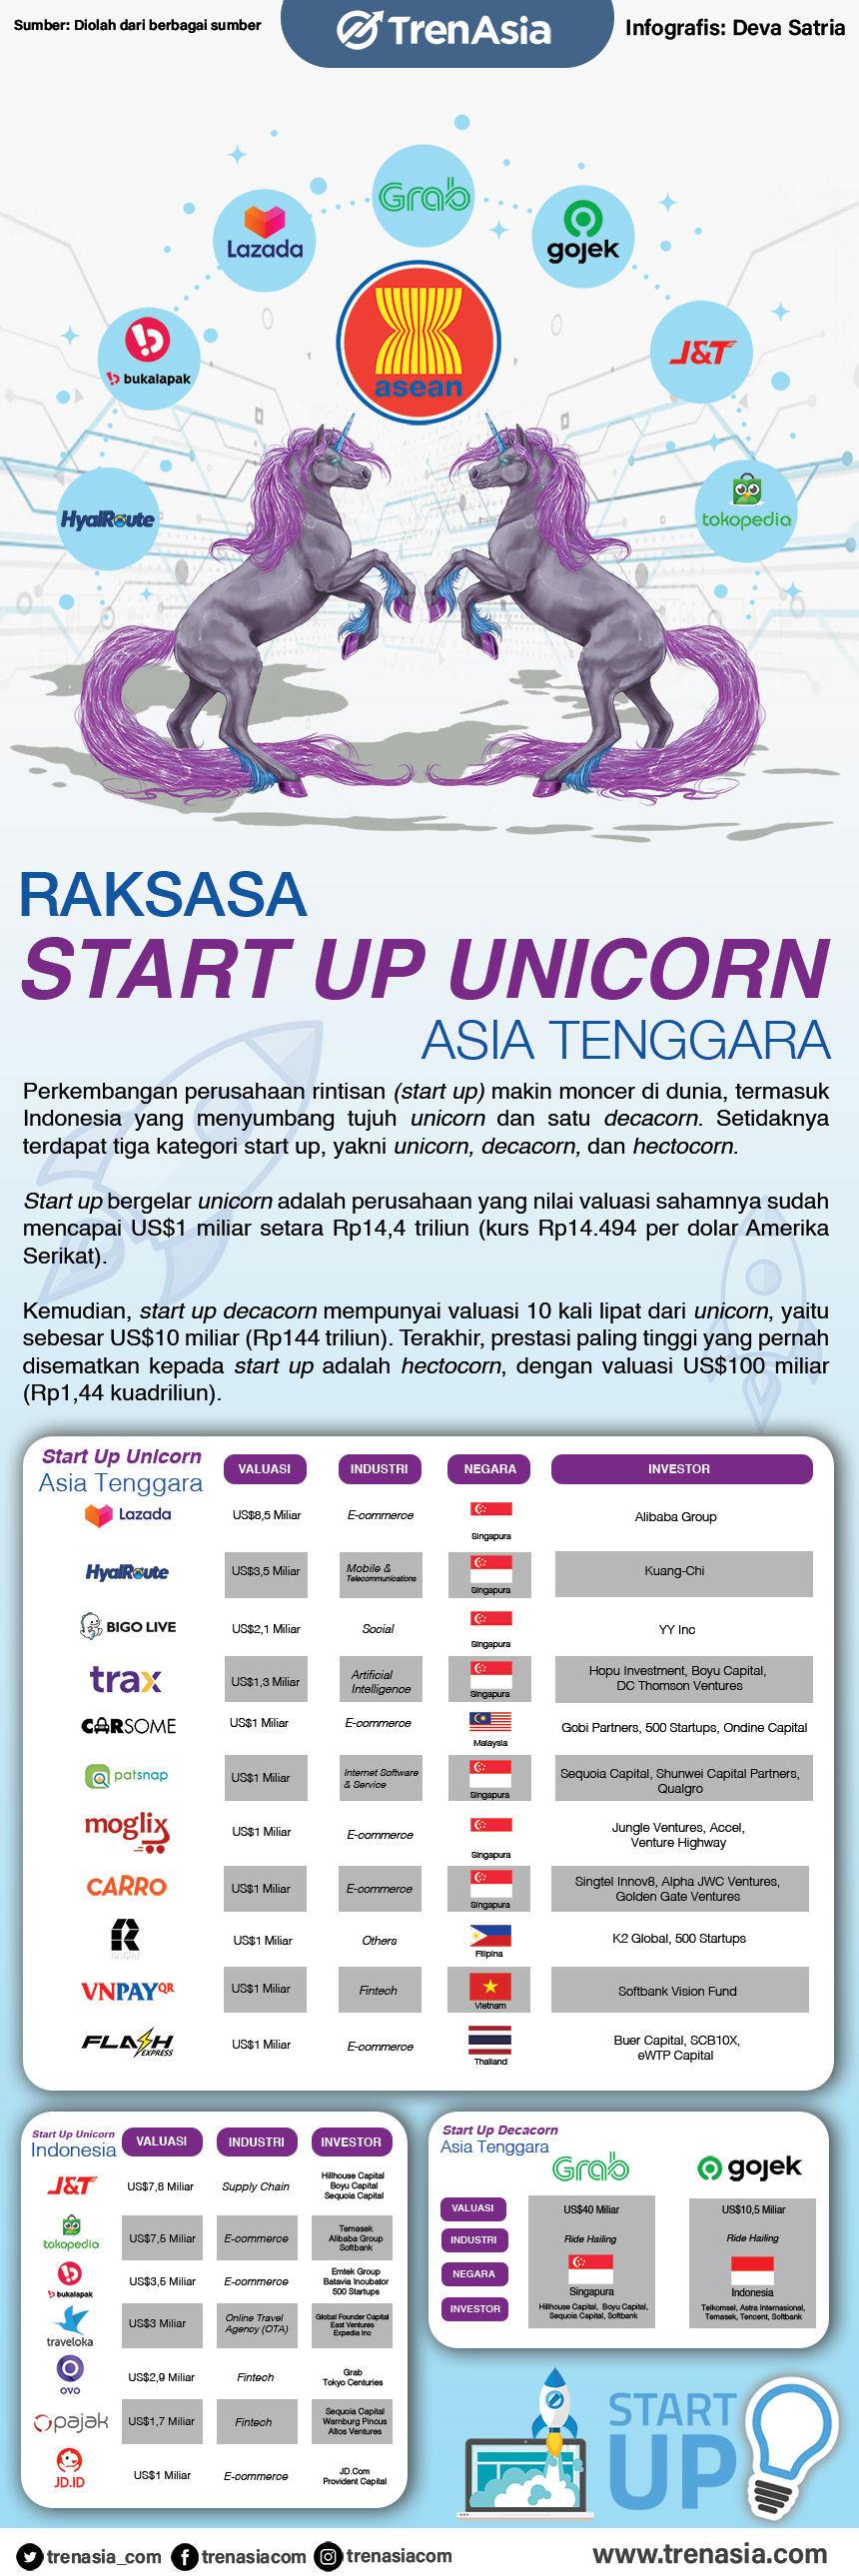 Raksasa Start Up Unicorn Asia Tenggara_Revisi.jpg